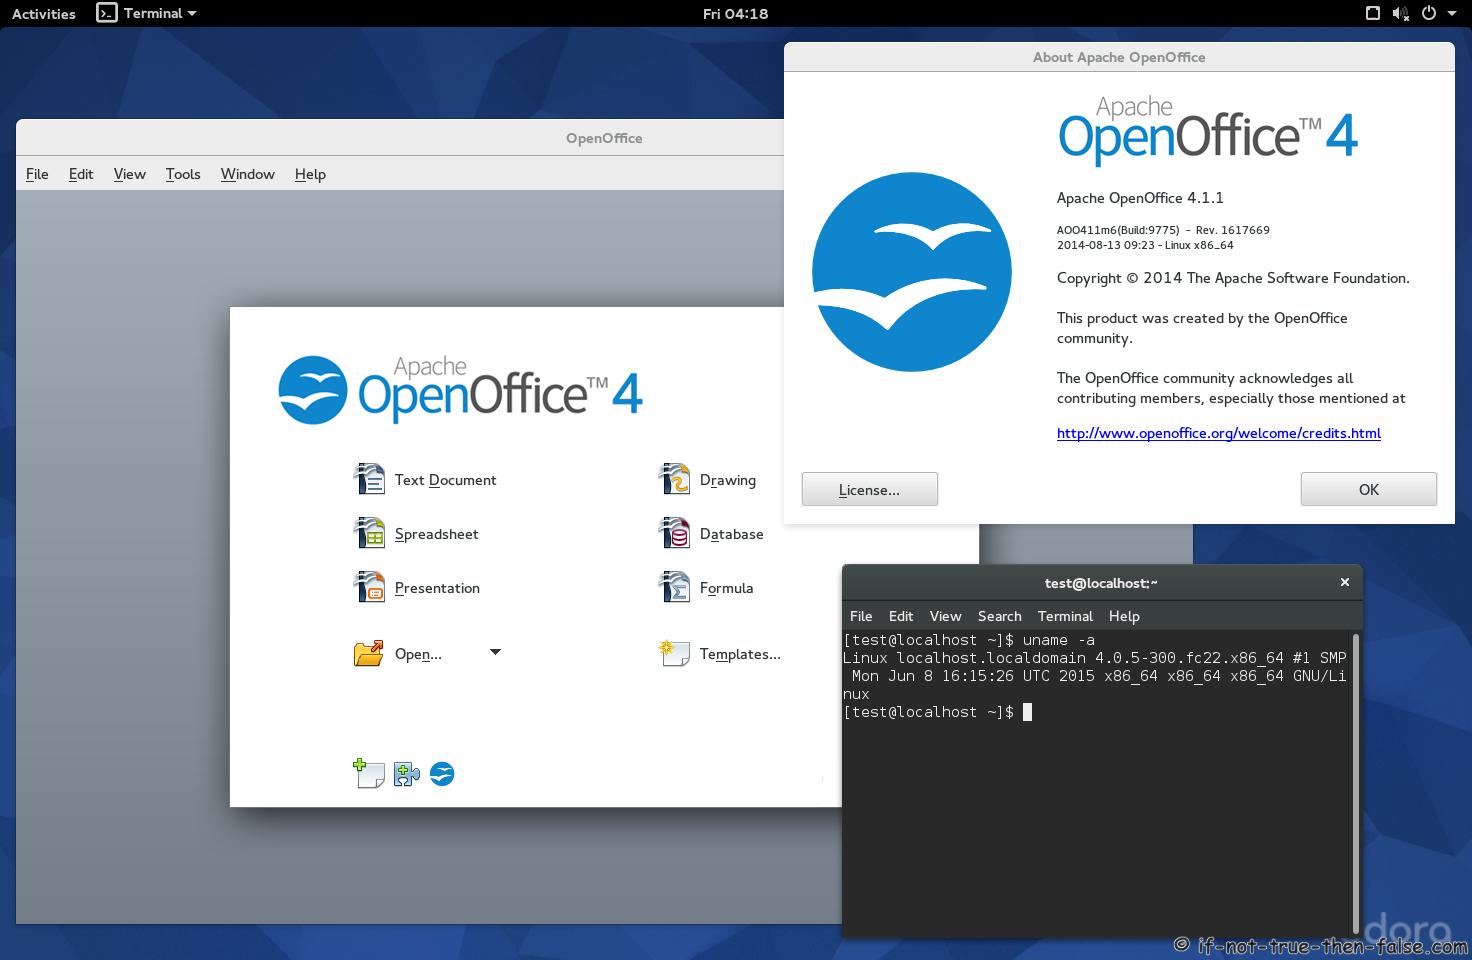 [Image: Apache-OpenOffice-4.1.1-on-Fedora-22.png]